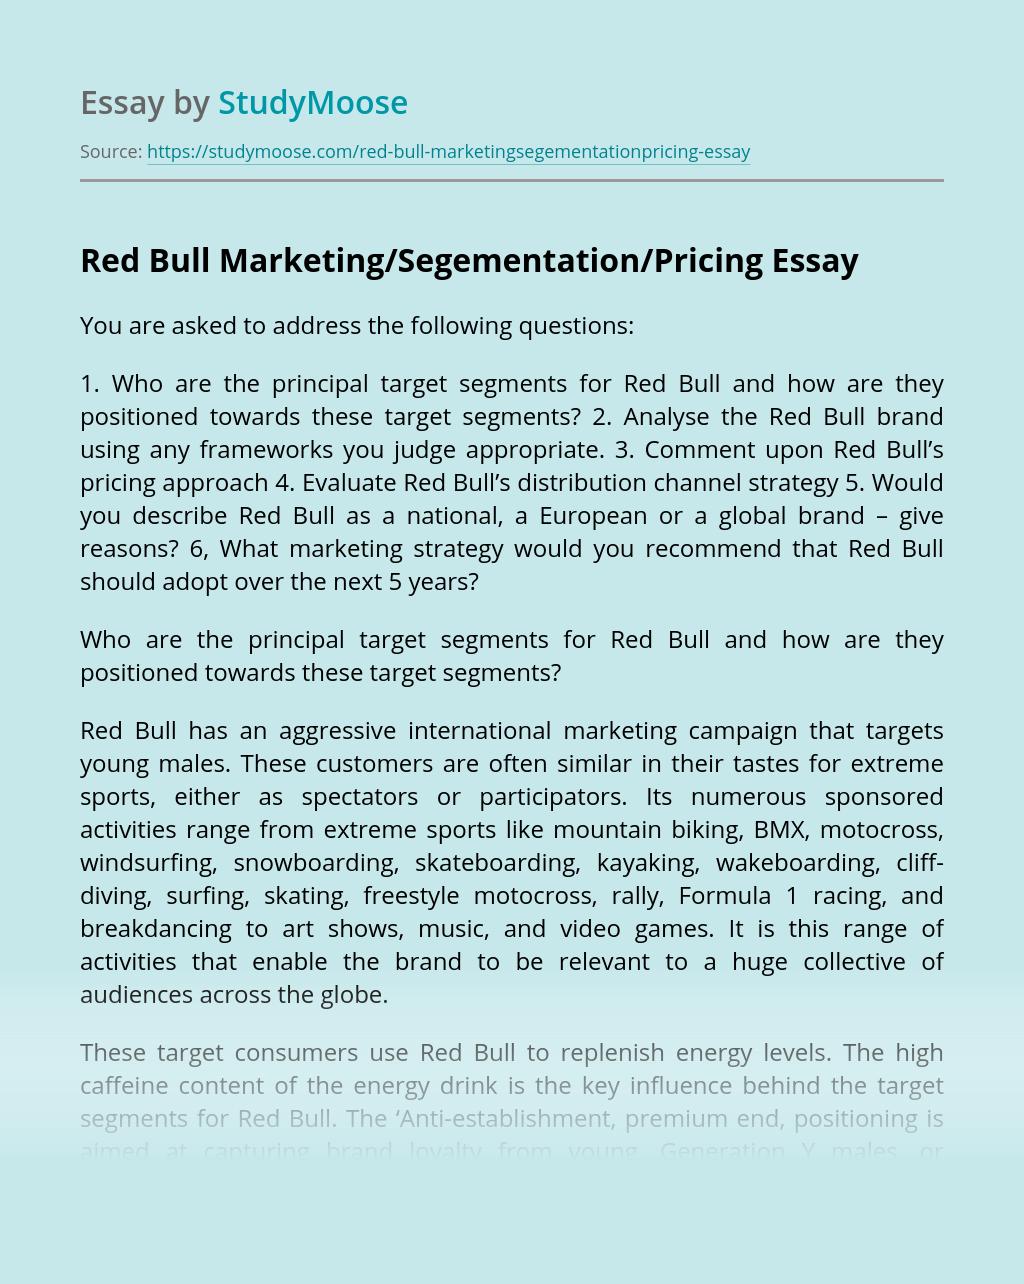 Red Bull Marketing/Segementation/Pricing